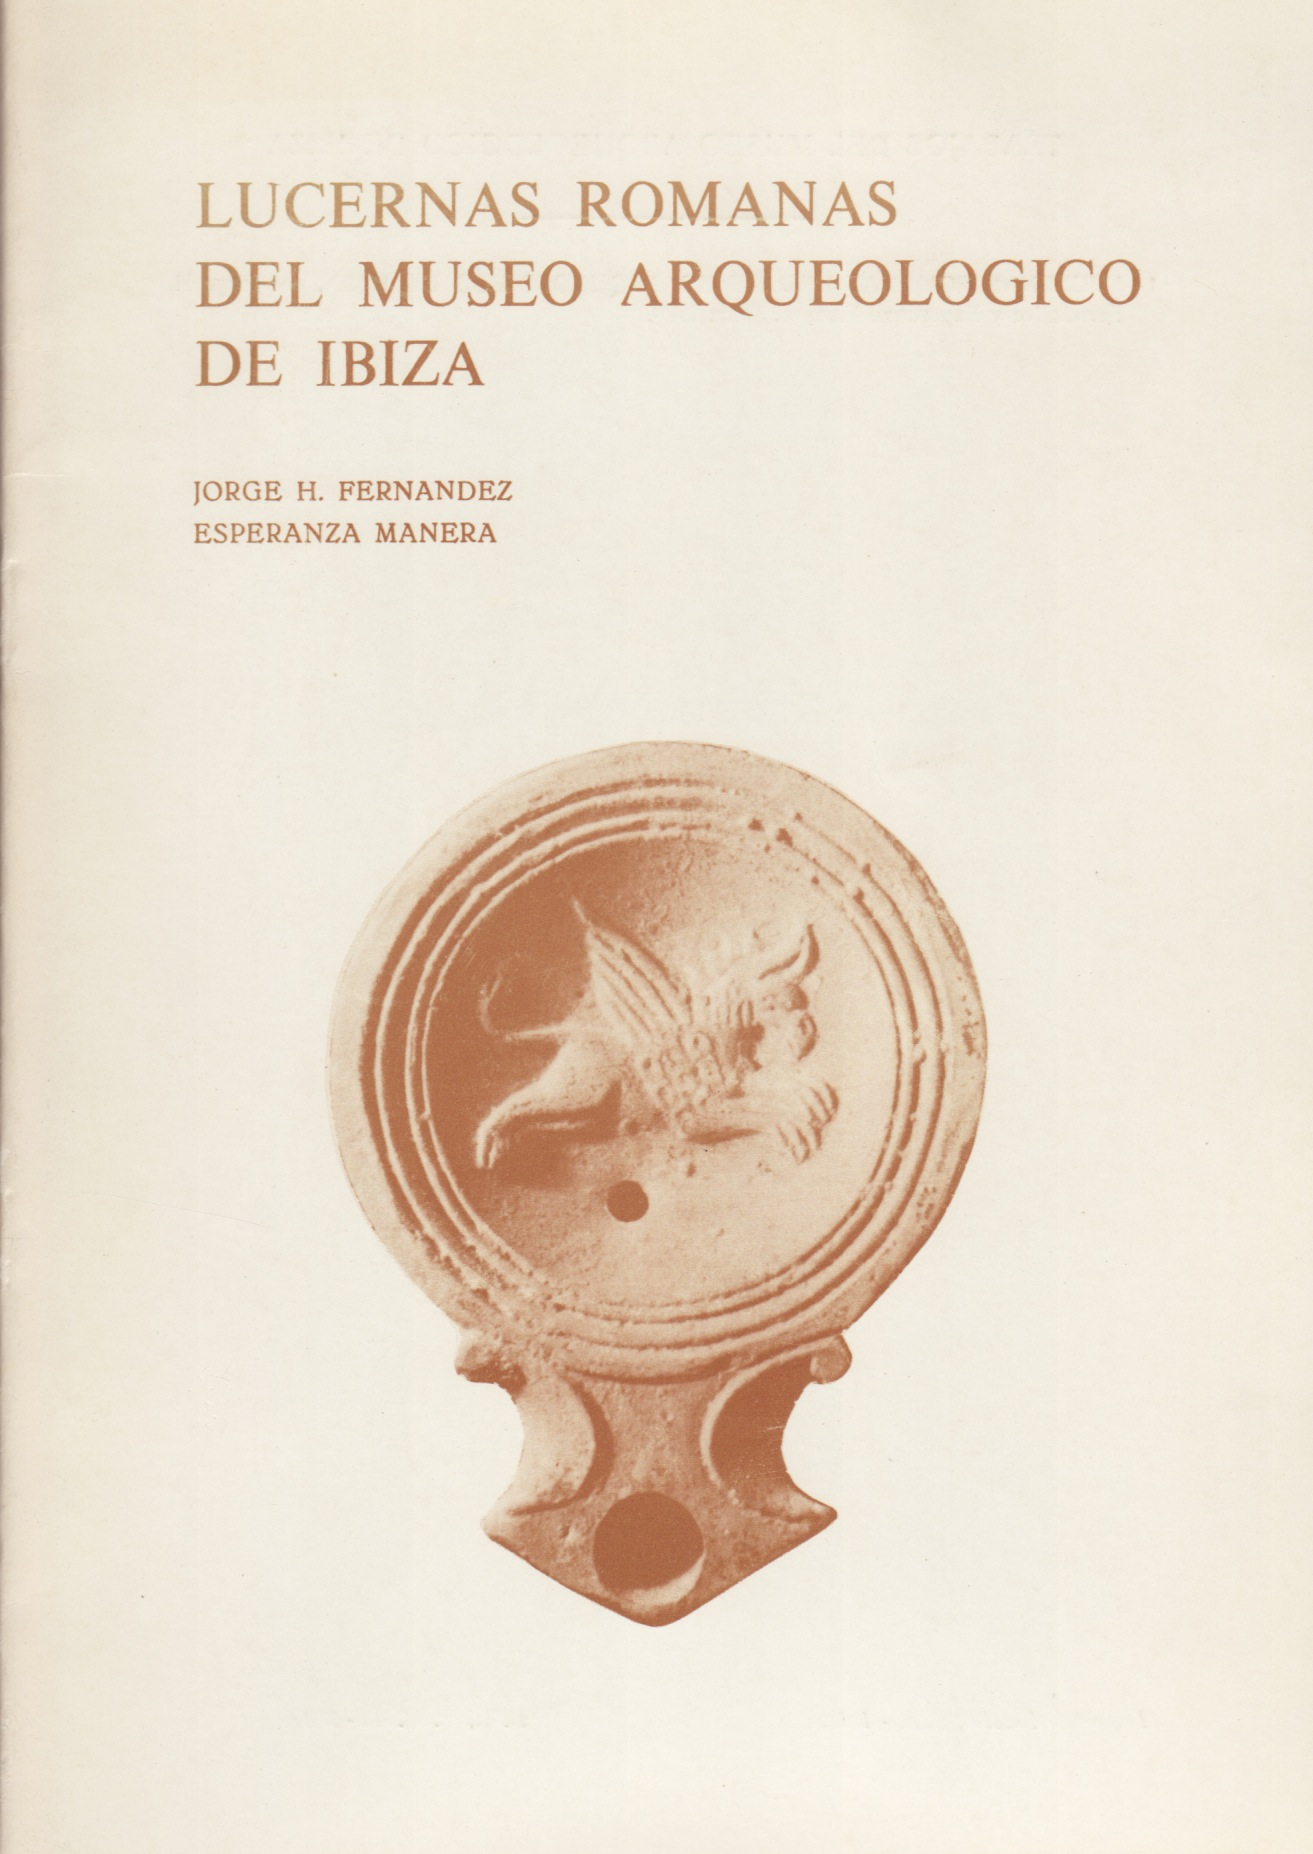 Fernandez Manera 1979